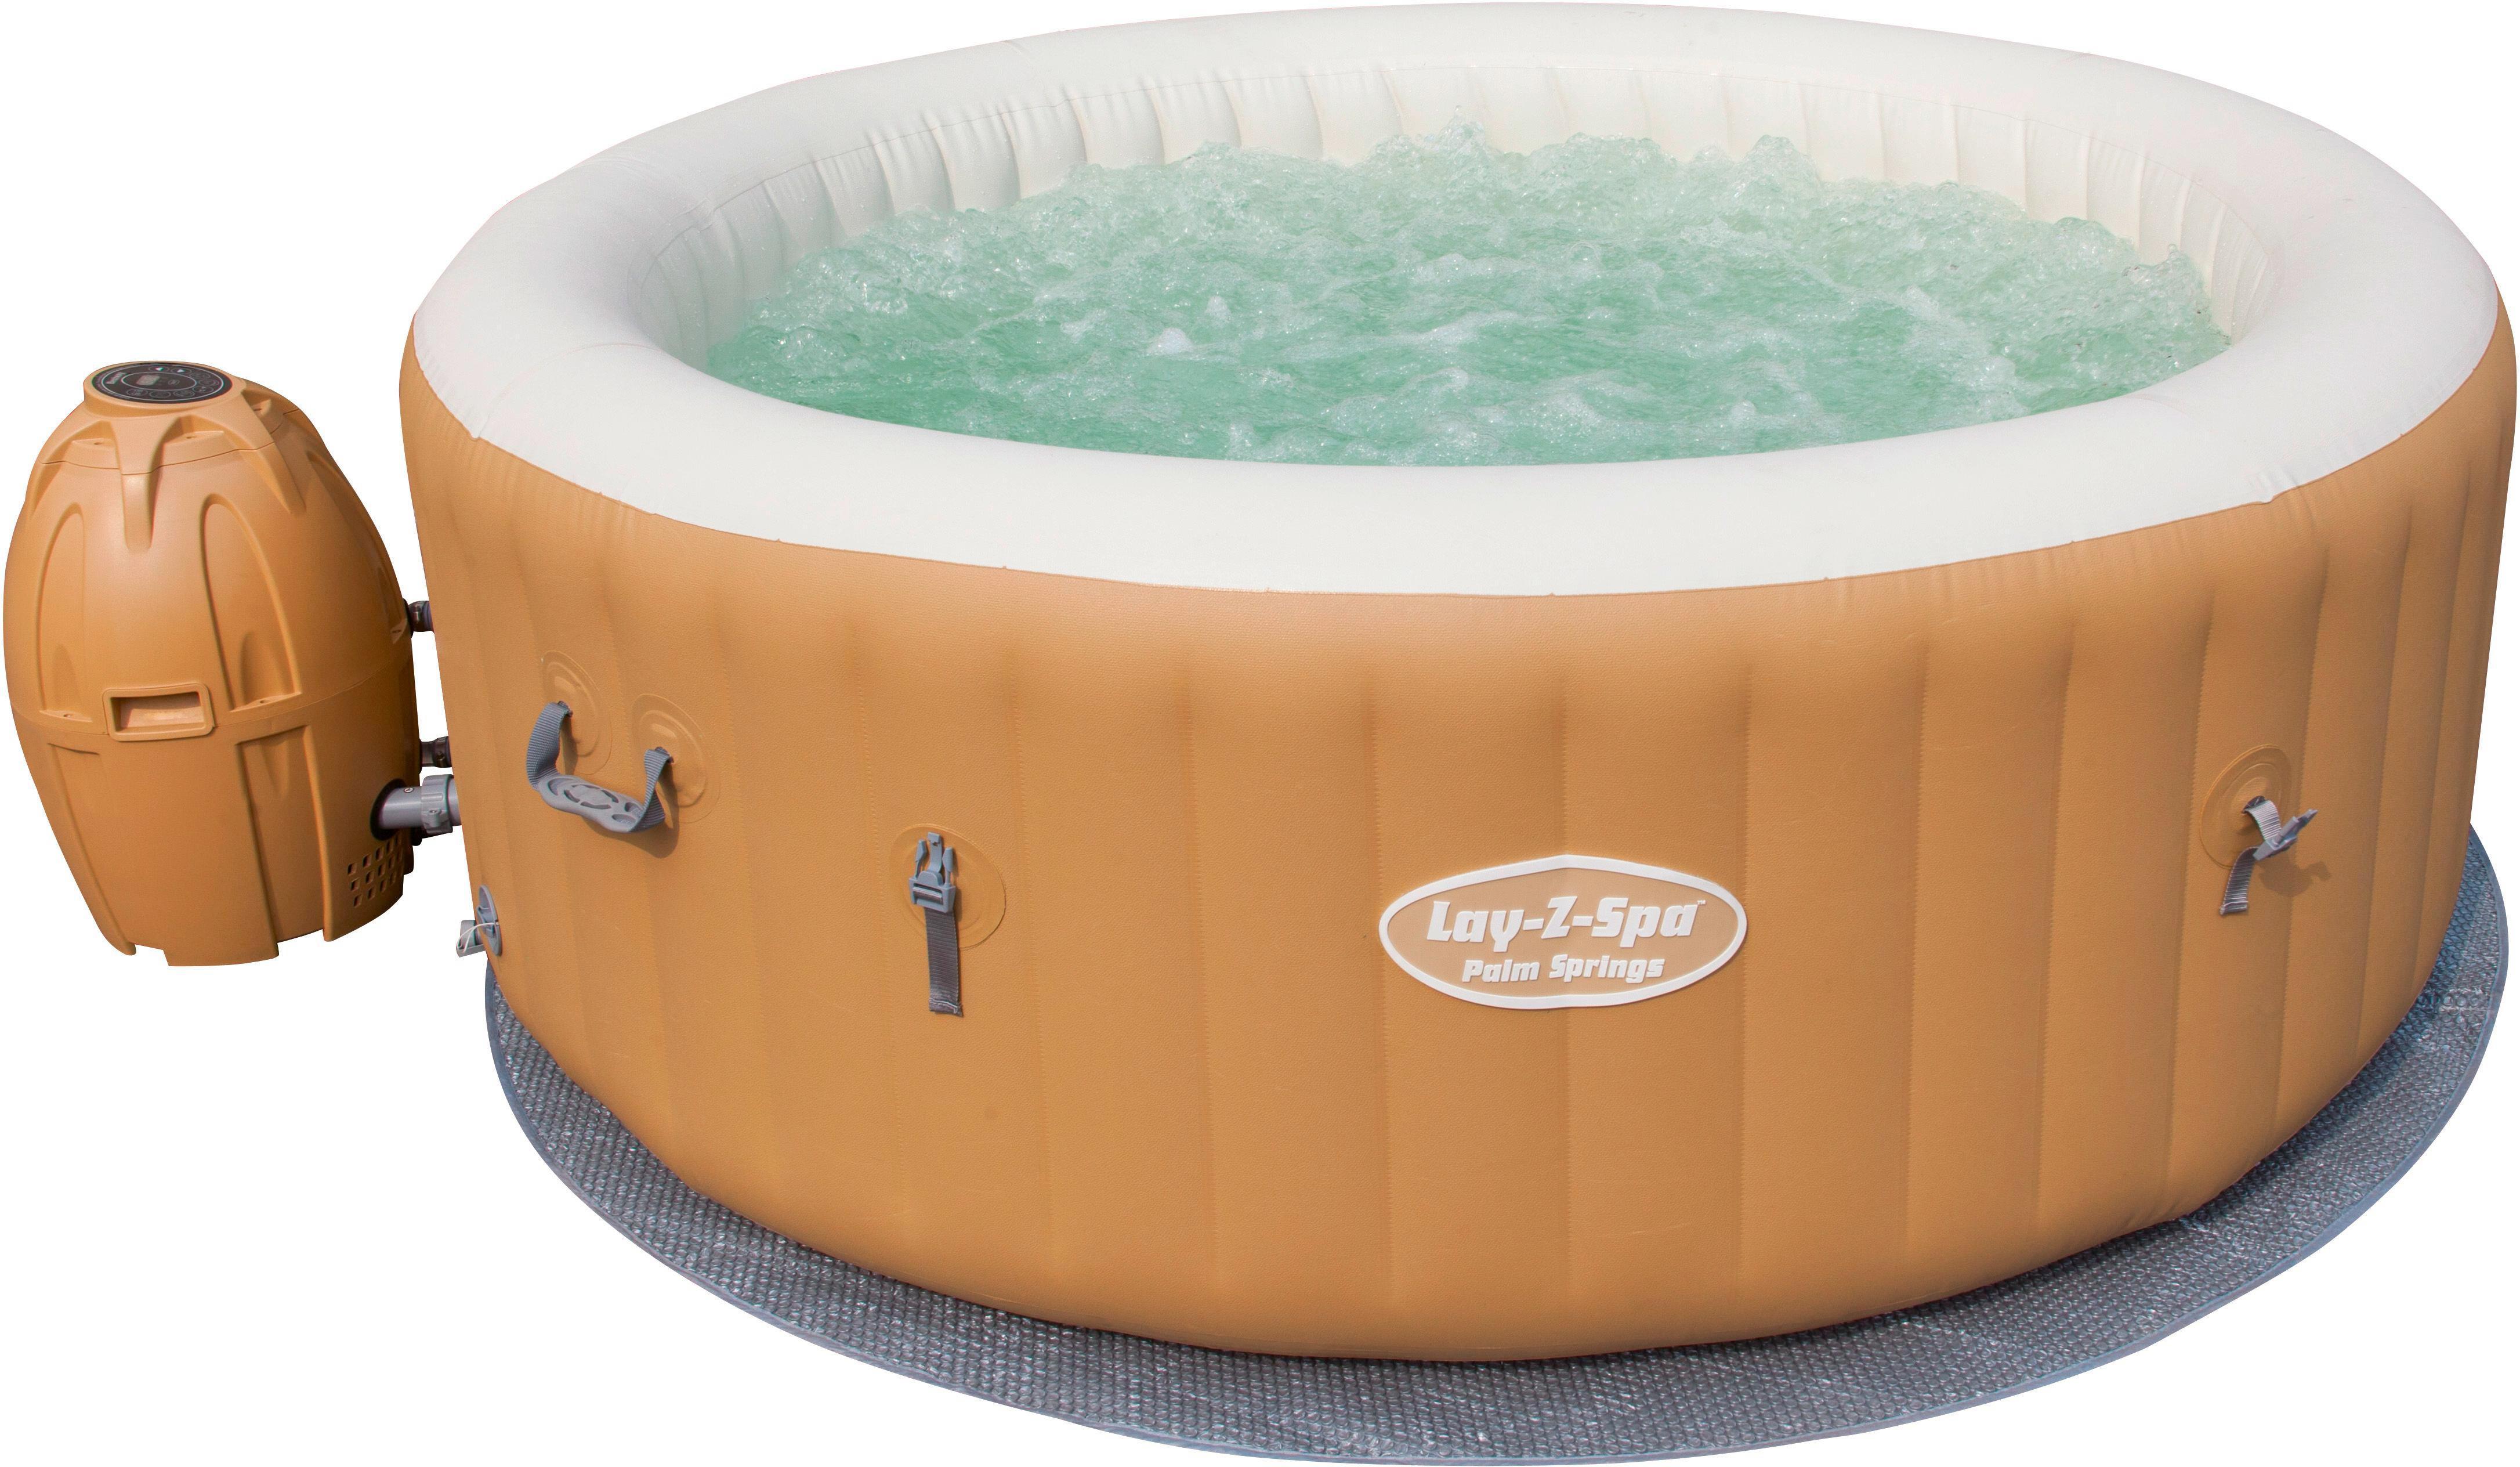 Indoor whirlpool aufblasbar  Bestway Whirlpool Lay-z-spa Palm Springs online kaufen ➤ Möbelix